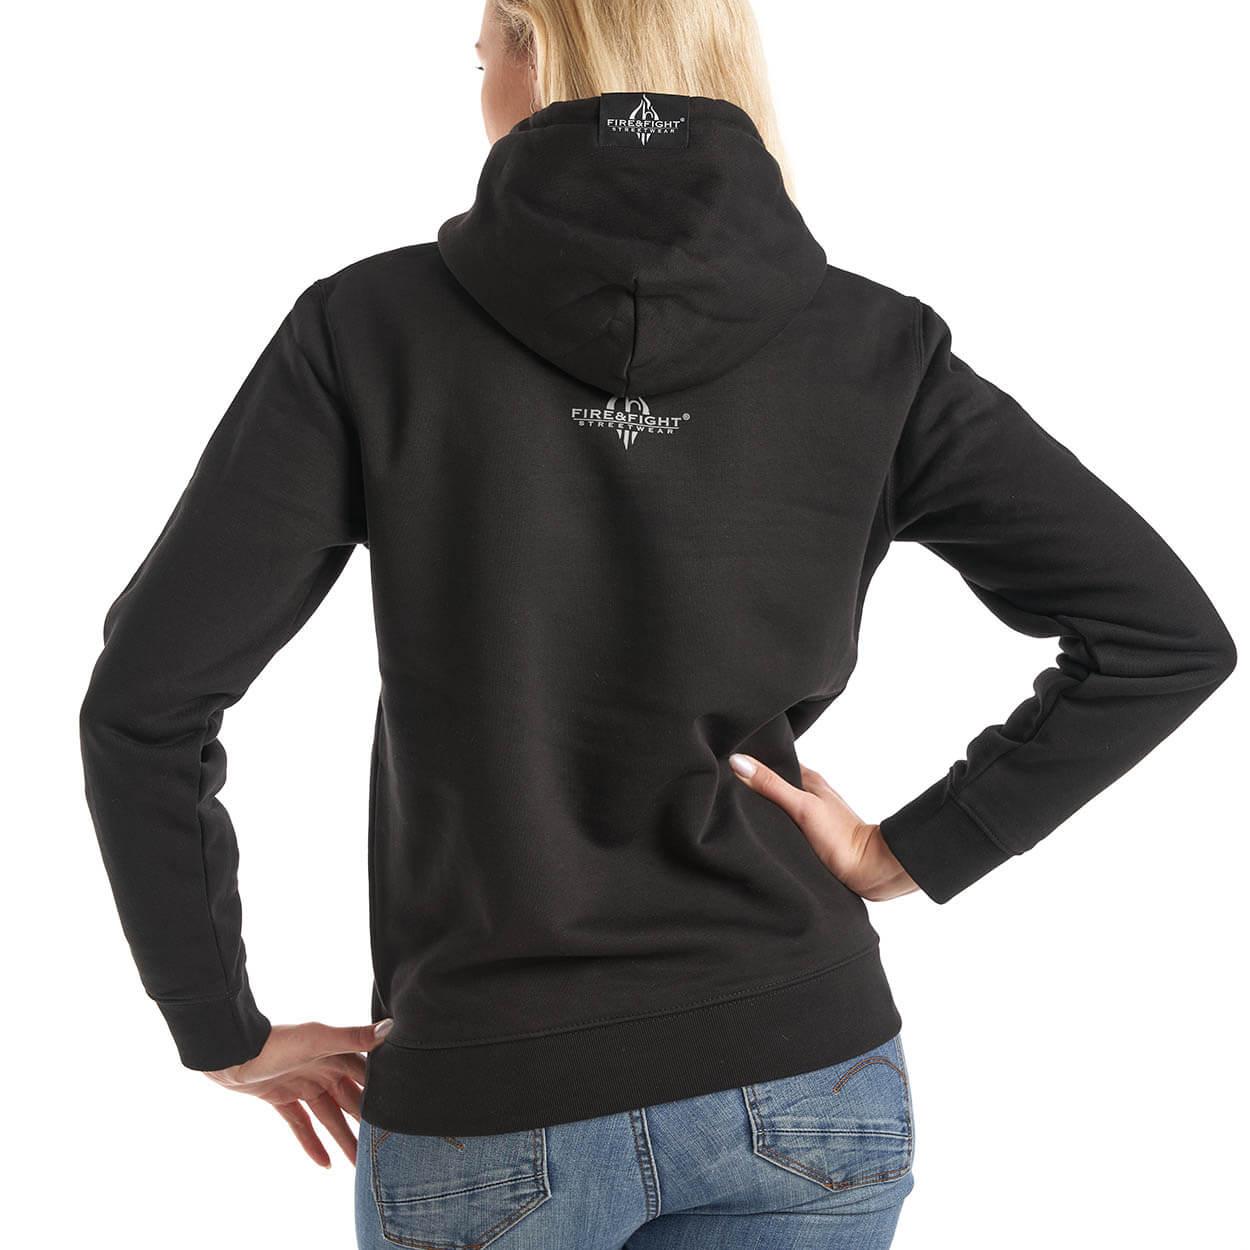 Feuerwehrfamilie Frauen-Kapuzensweater Farbe schwarz